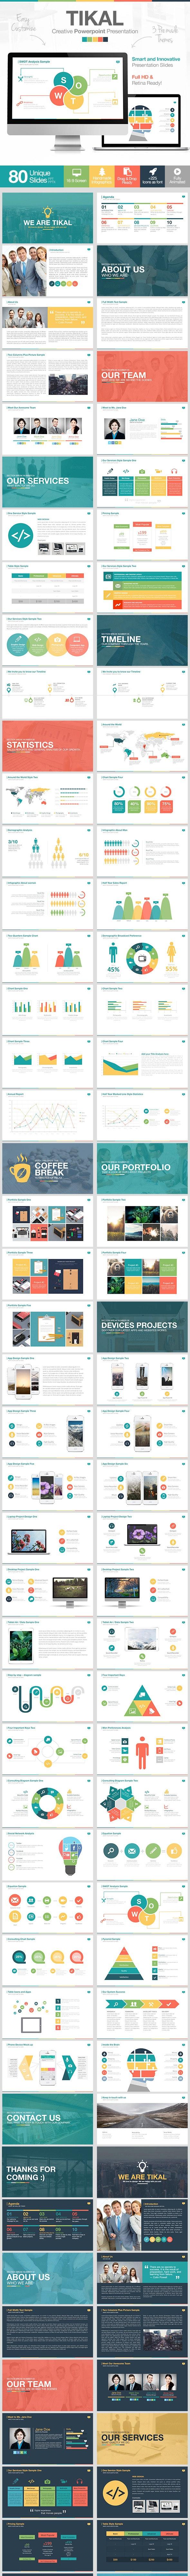 Tikal PowerPoint Presentation Template - Business PowerPoint Templates